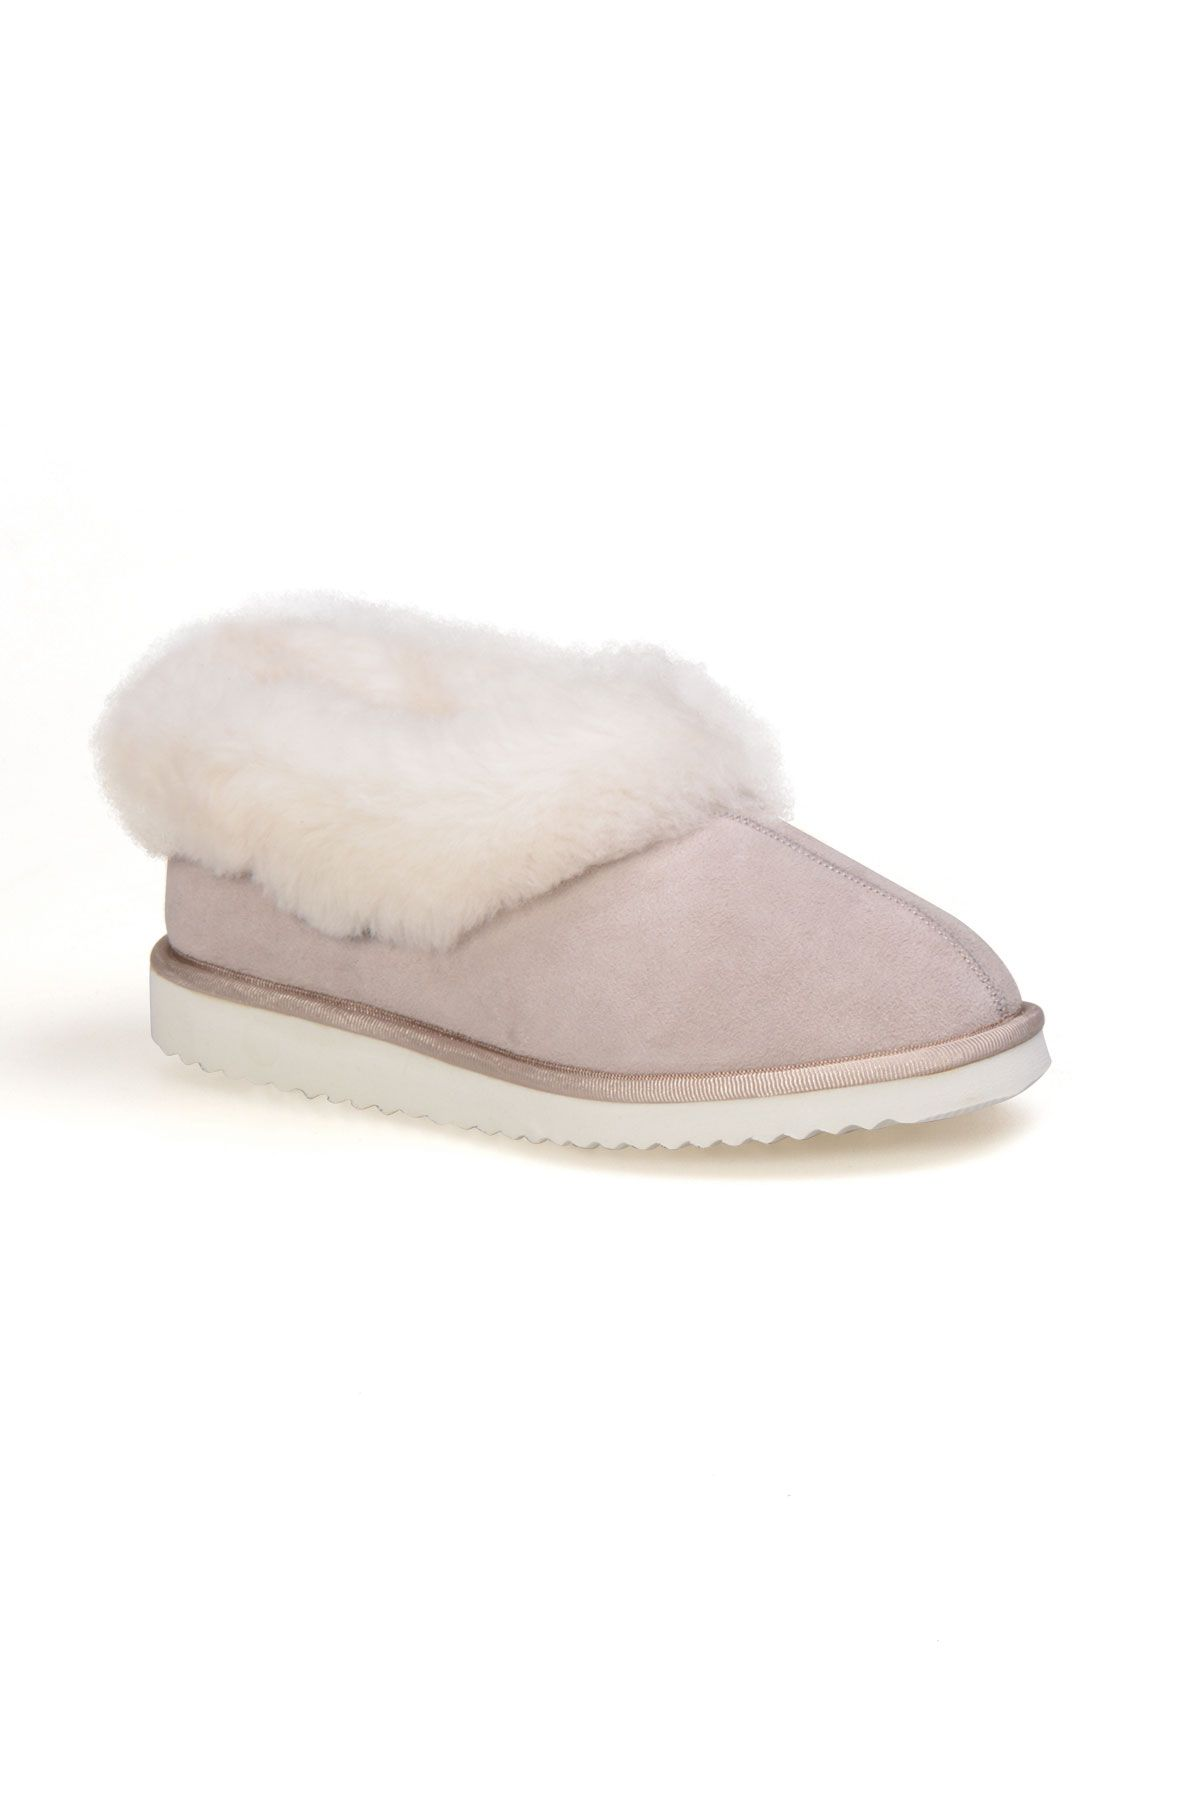 Pegia Genuine Suede Women's Sheepskin Lined House Shoes 191100 Beige